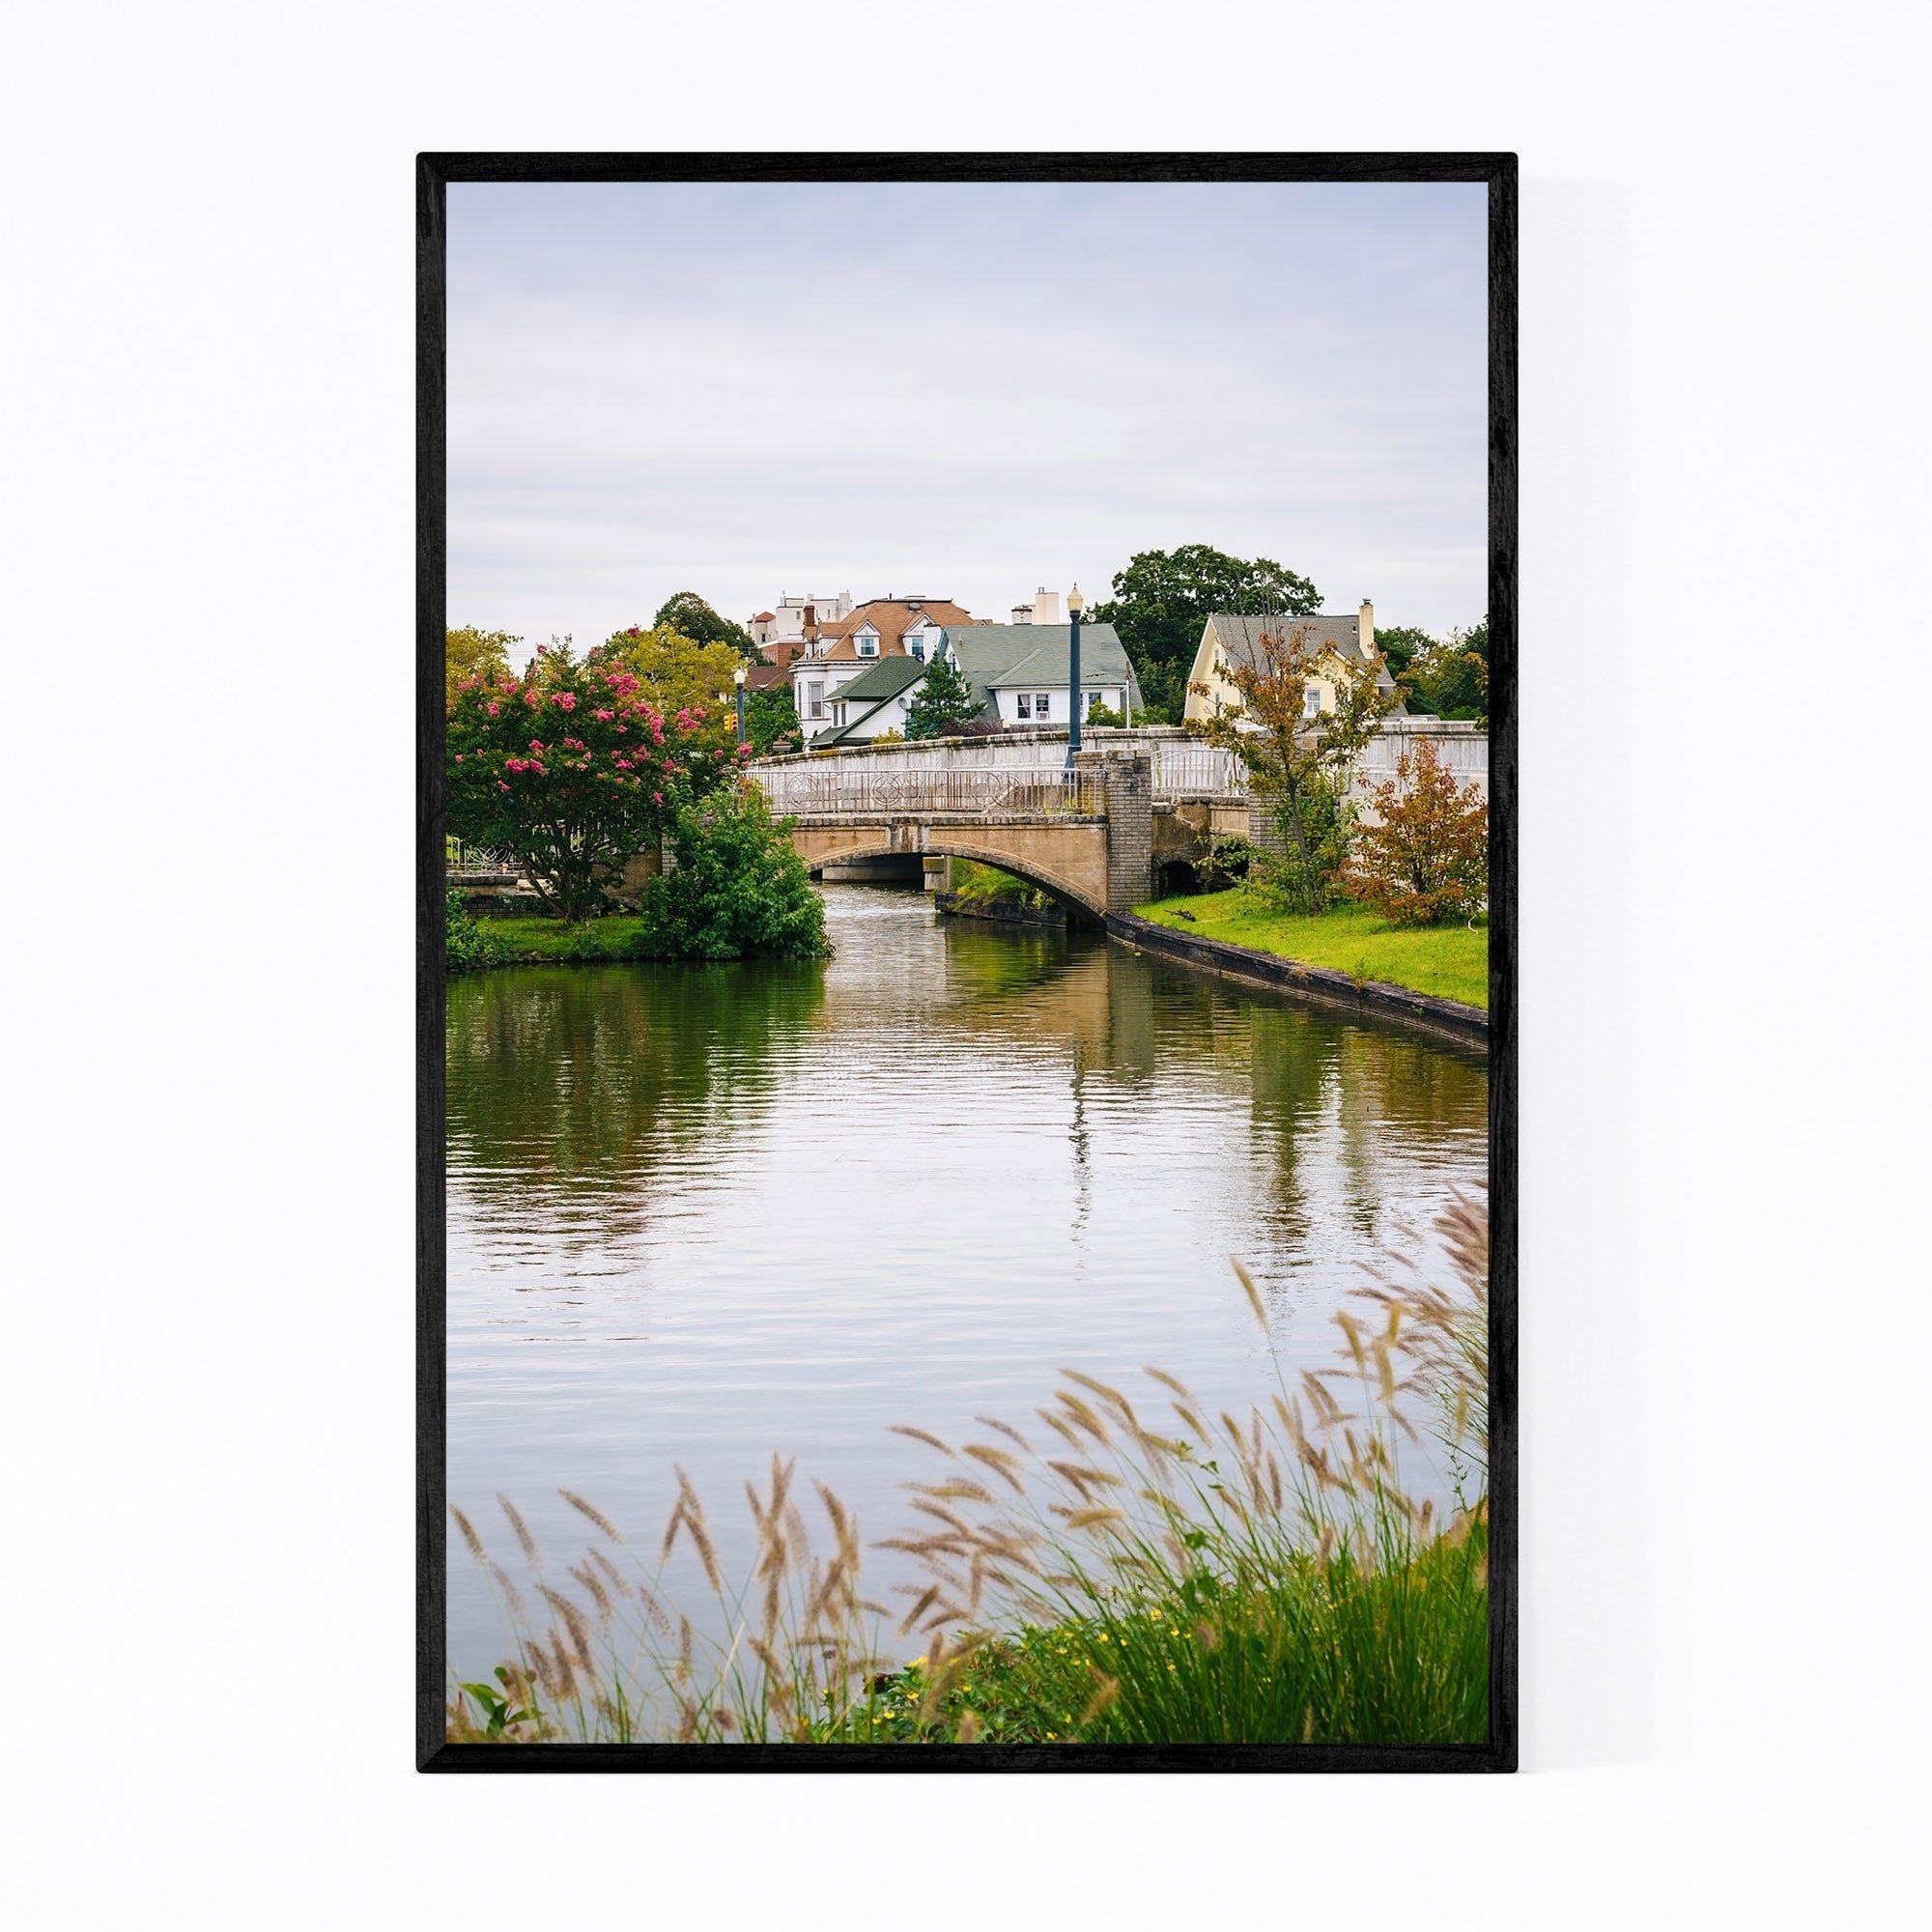 Noir gallery lake norman north carolina framed art print